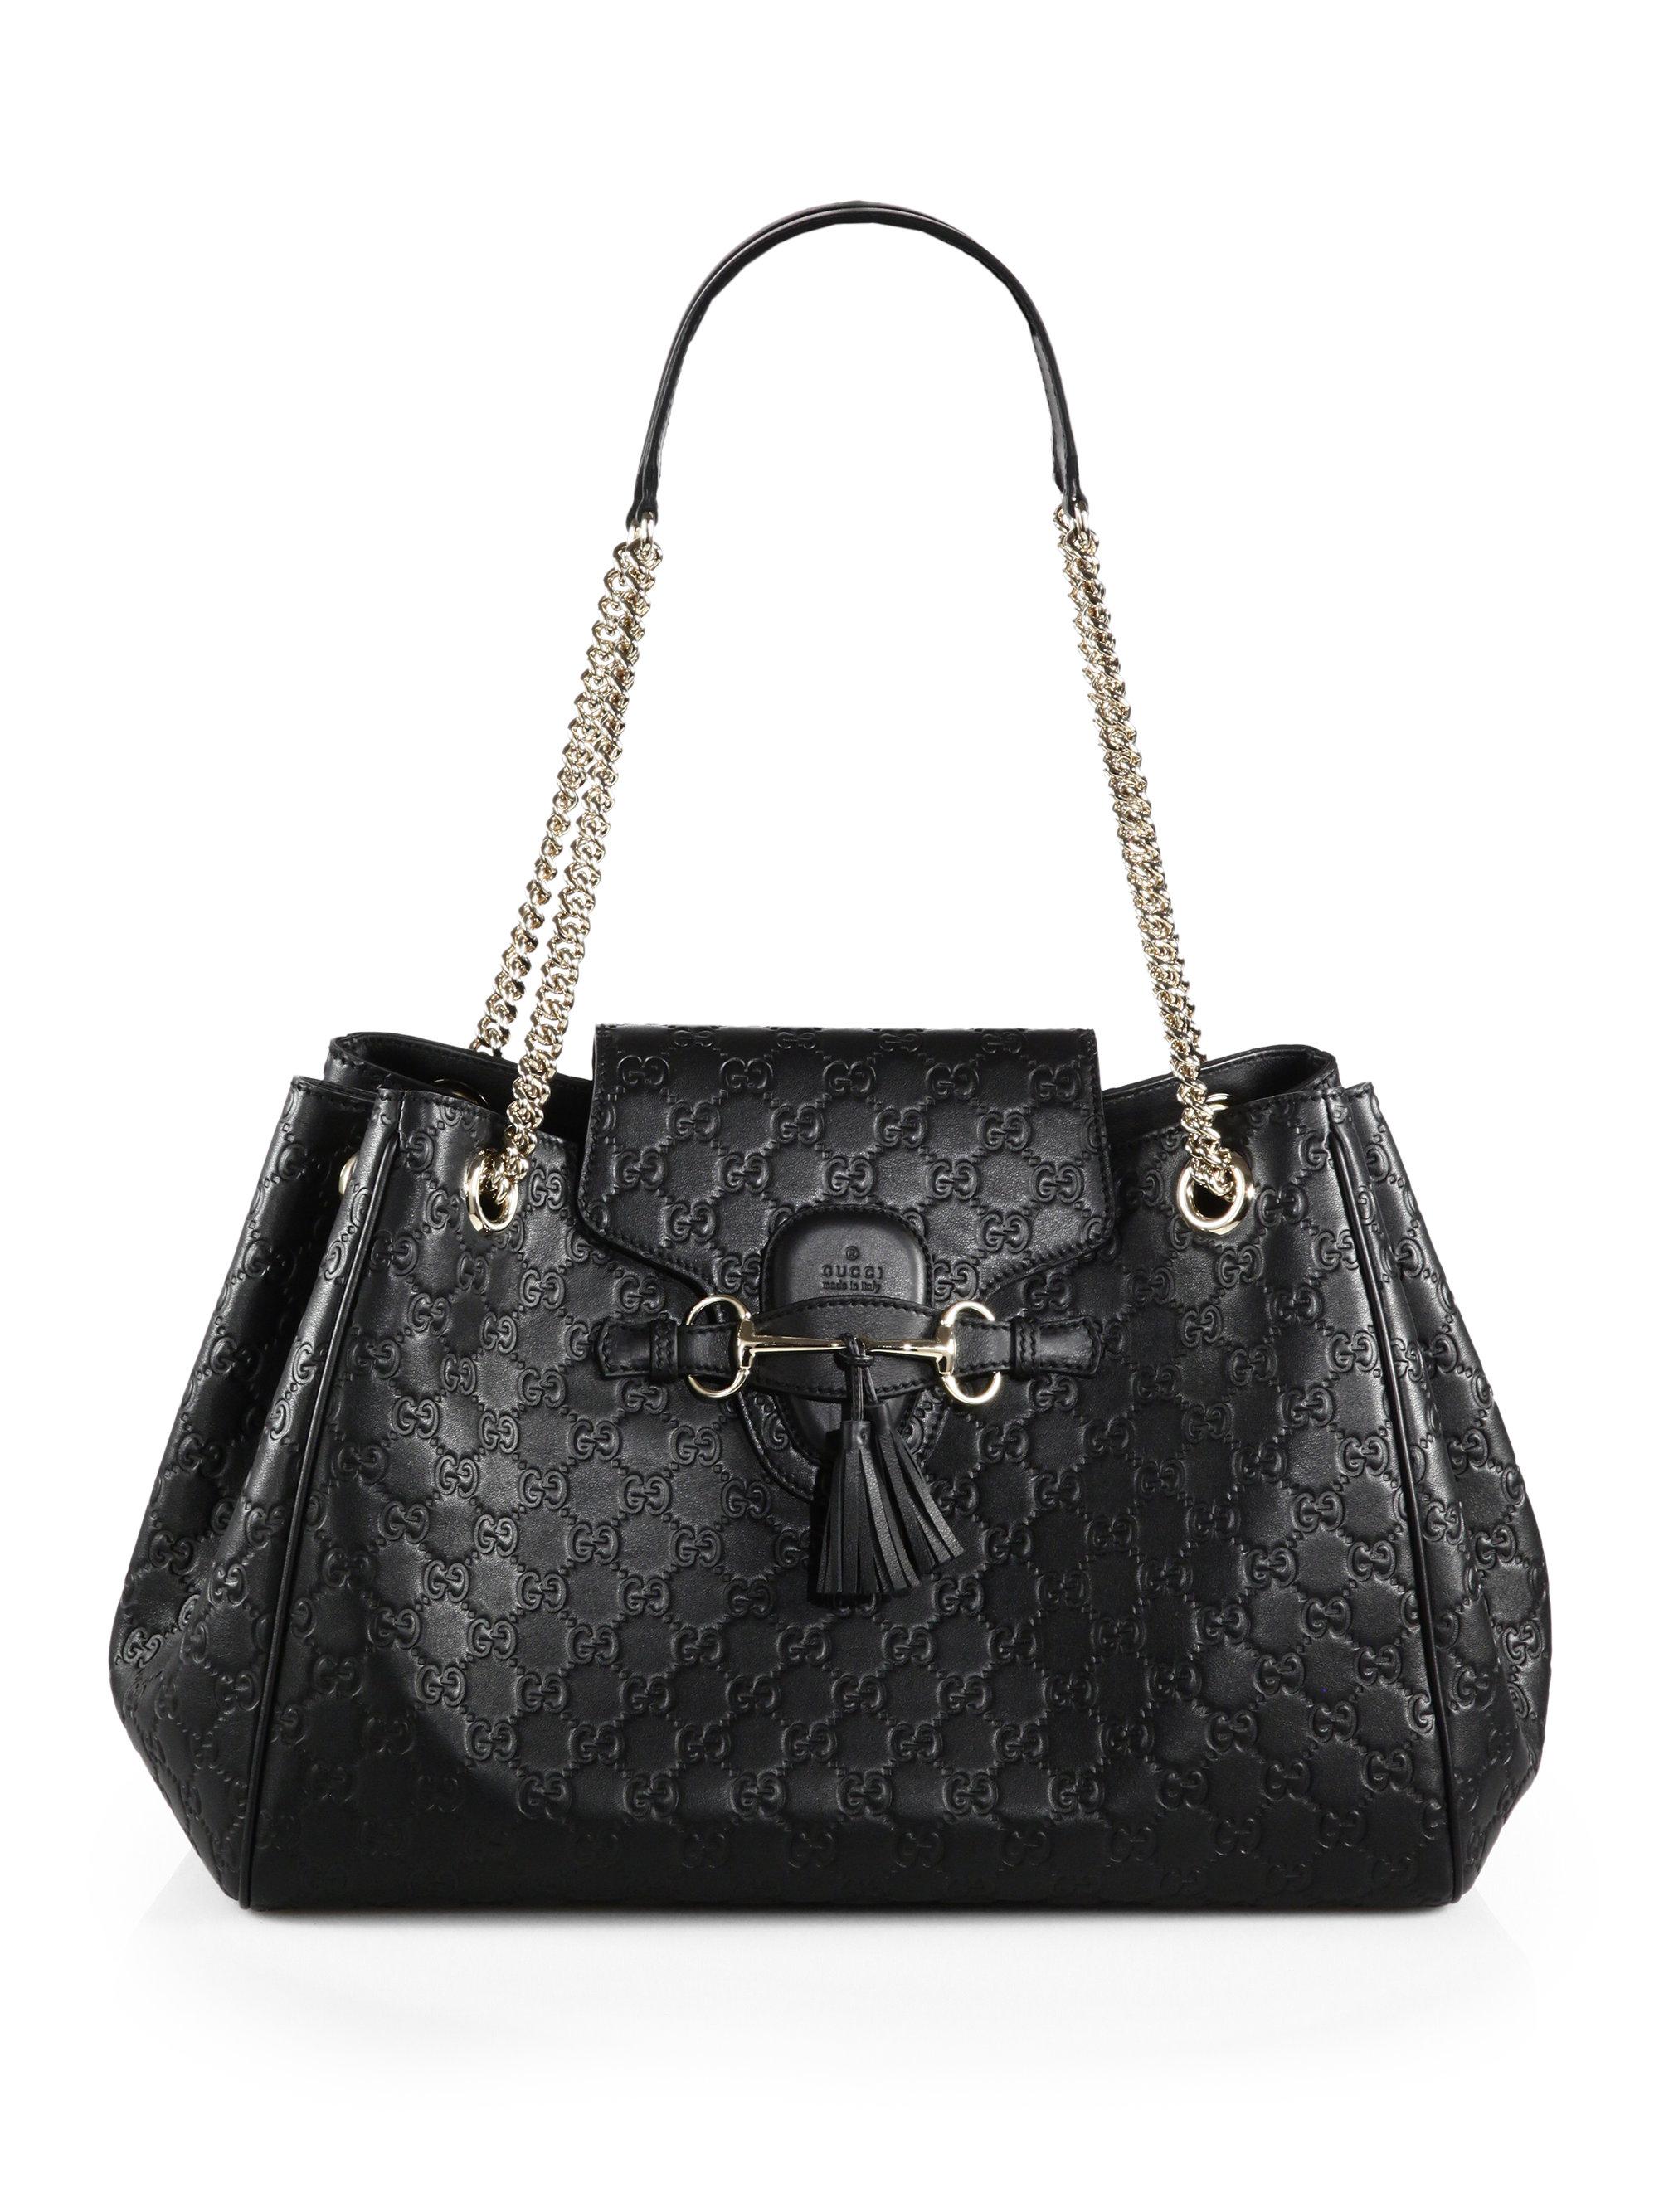 gucci emily ssima leather shoulder bag in black lyst